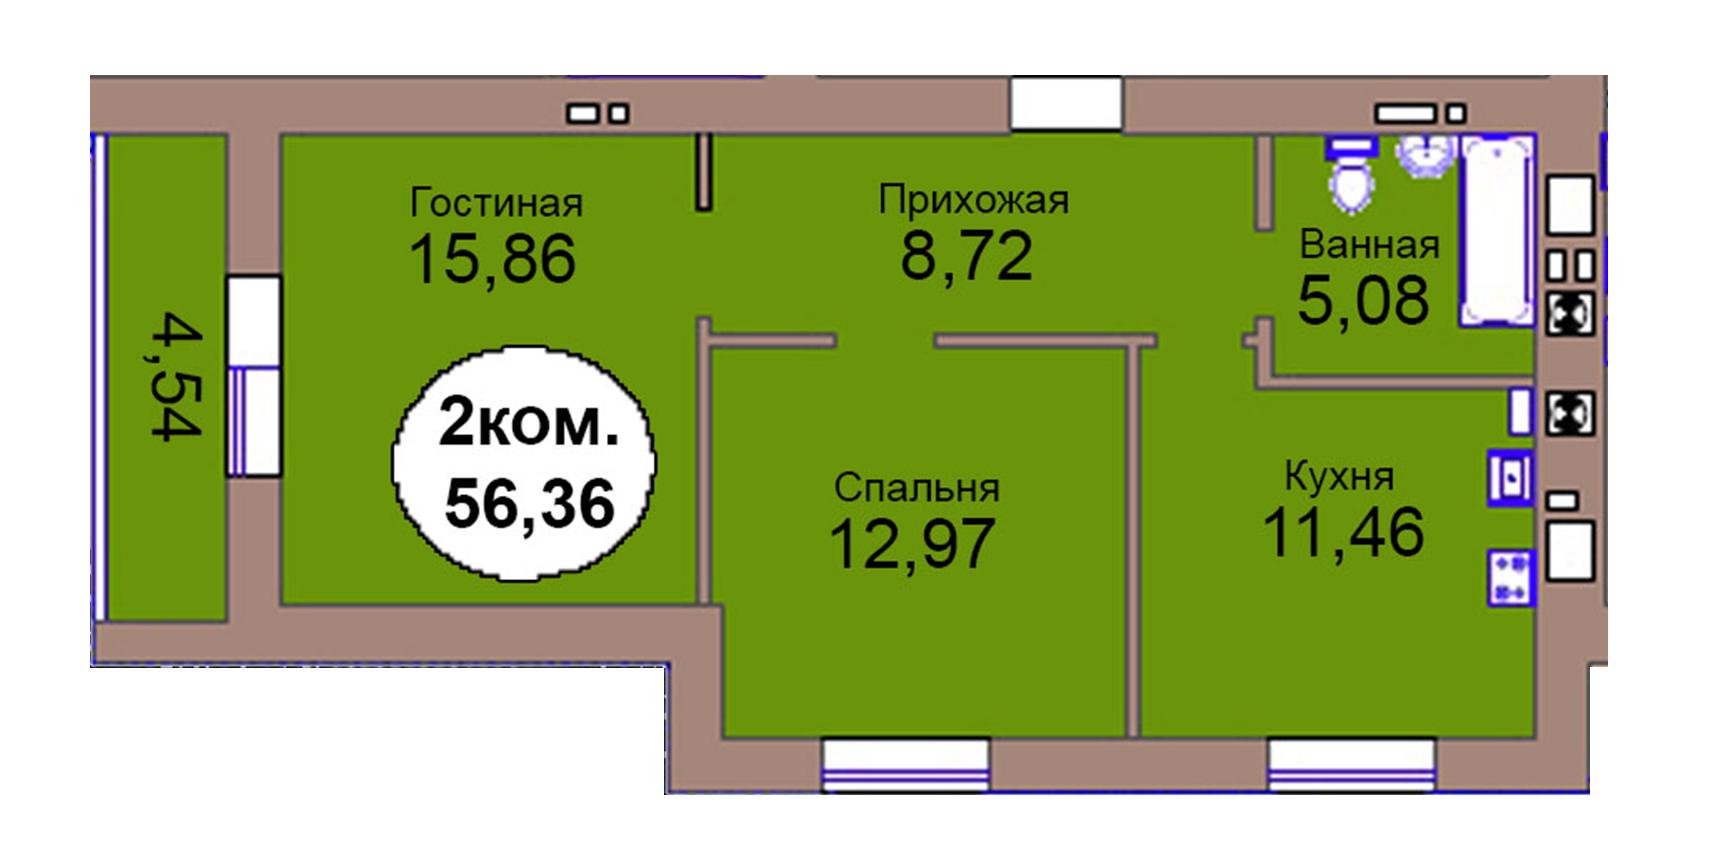 2-комн. кв. по пер. Калининградский, 4  кв. 110 в Калининграде